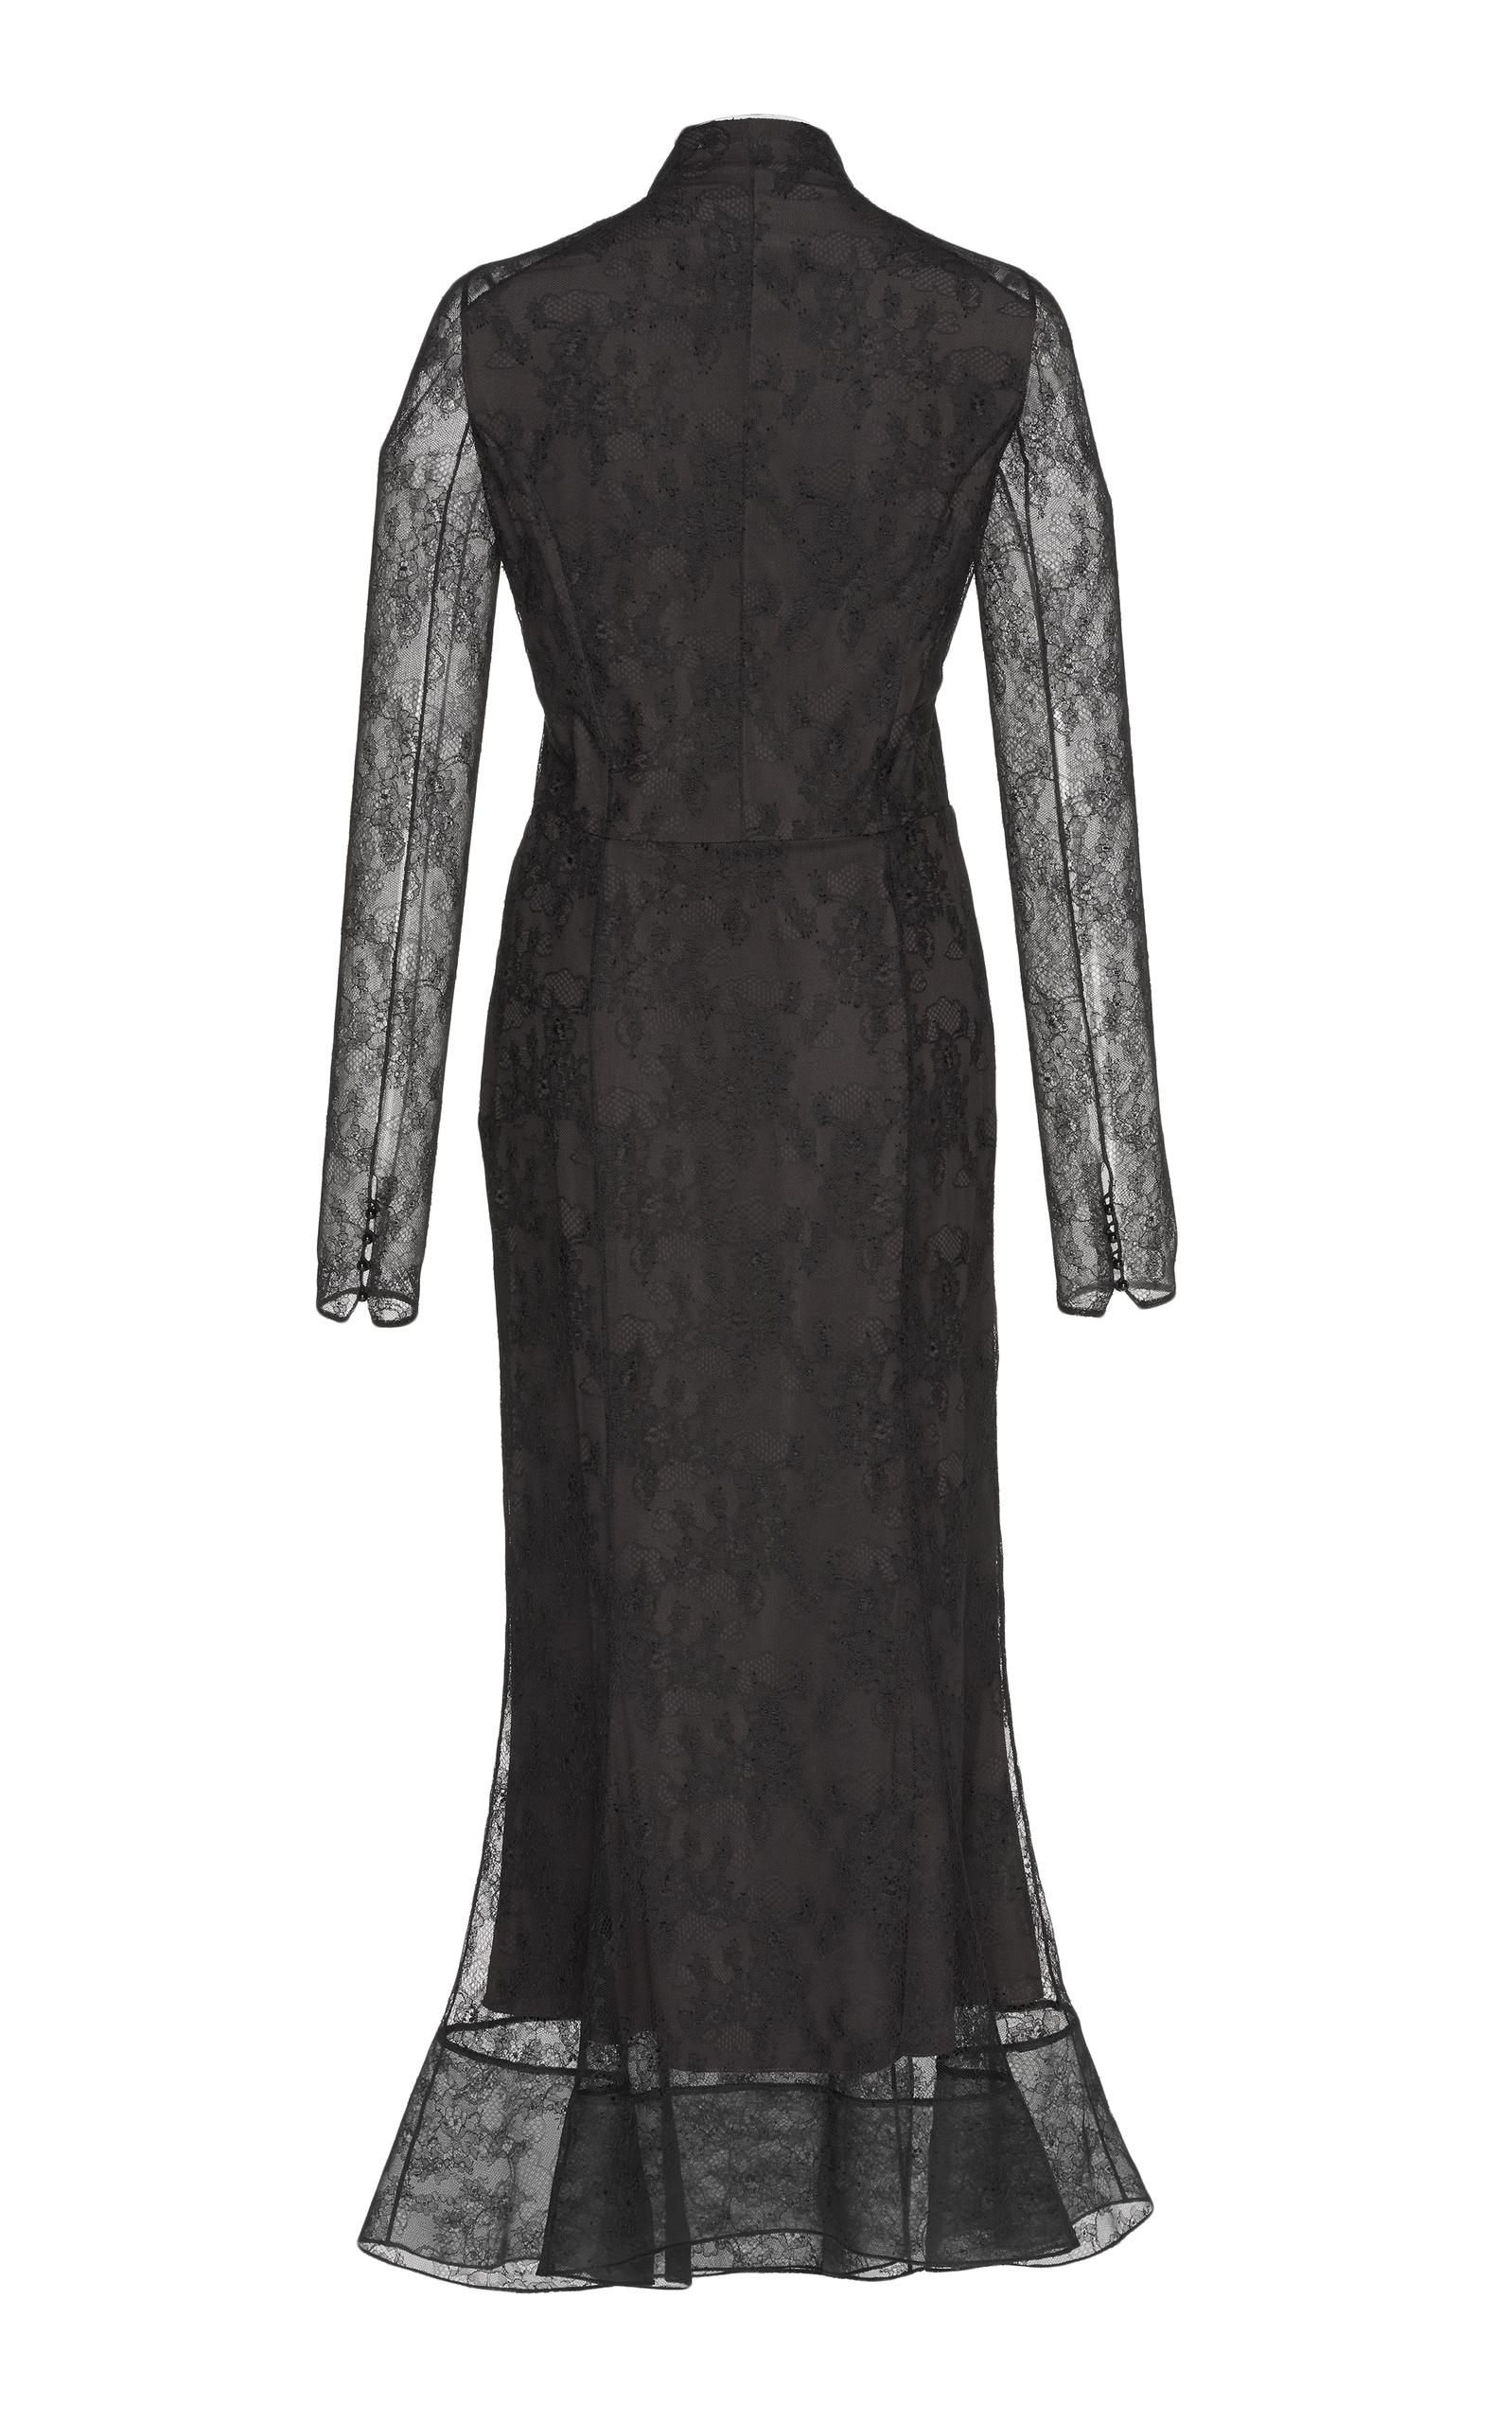 Long Sleeved Cocktail Dress by Olivier Theyskens | Moda Operandi